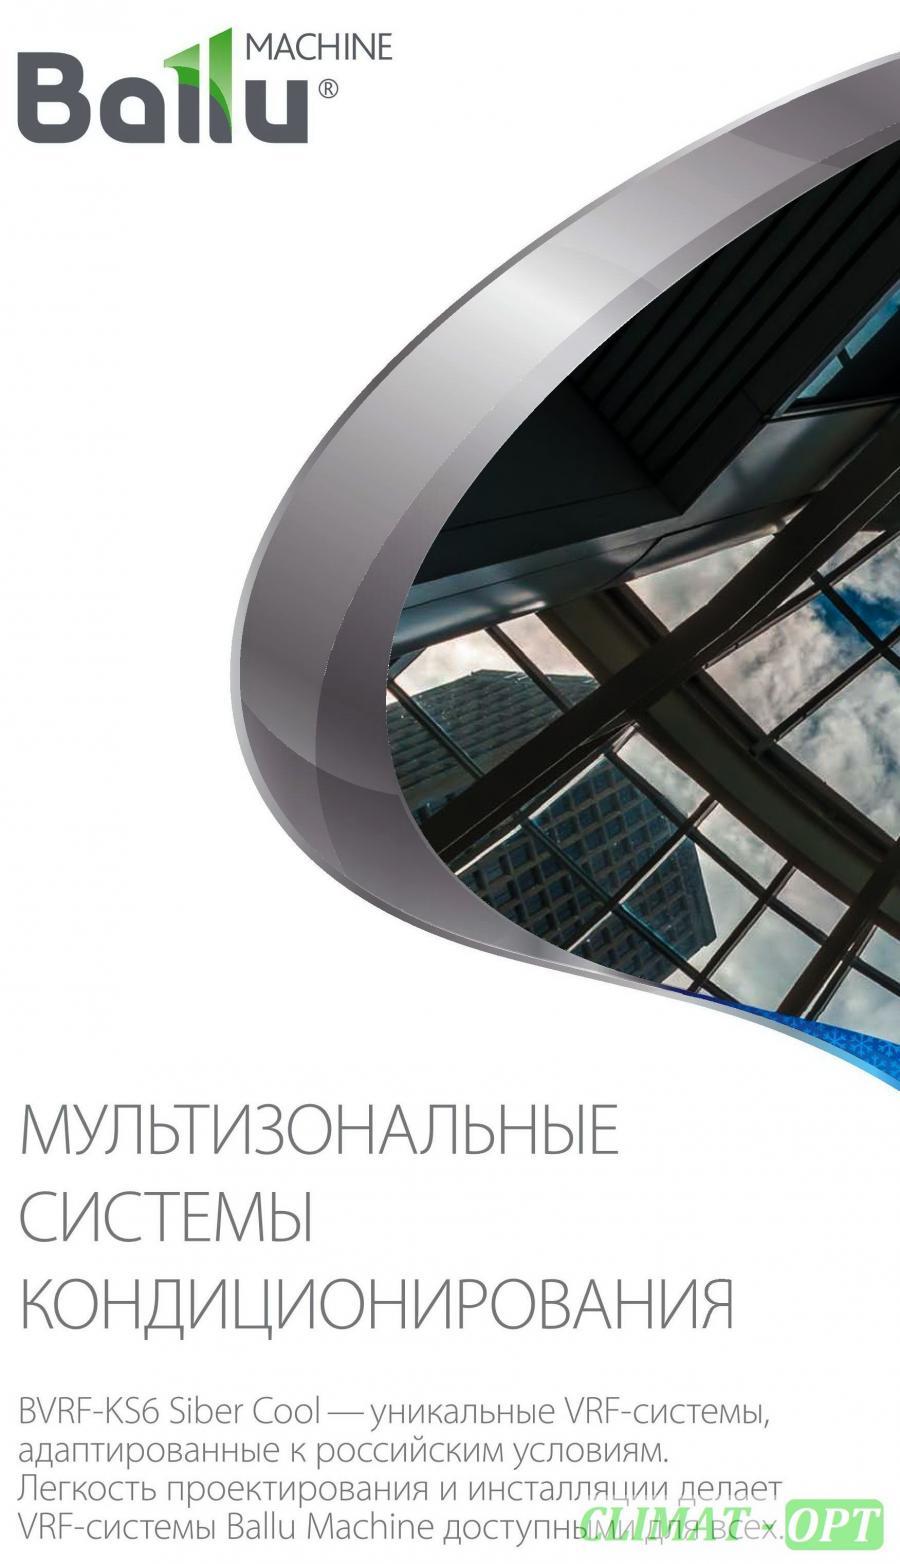 VRF-система Ballu объединение до 3-х блоков BVRFO-KS6_A